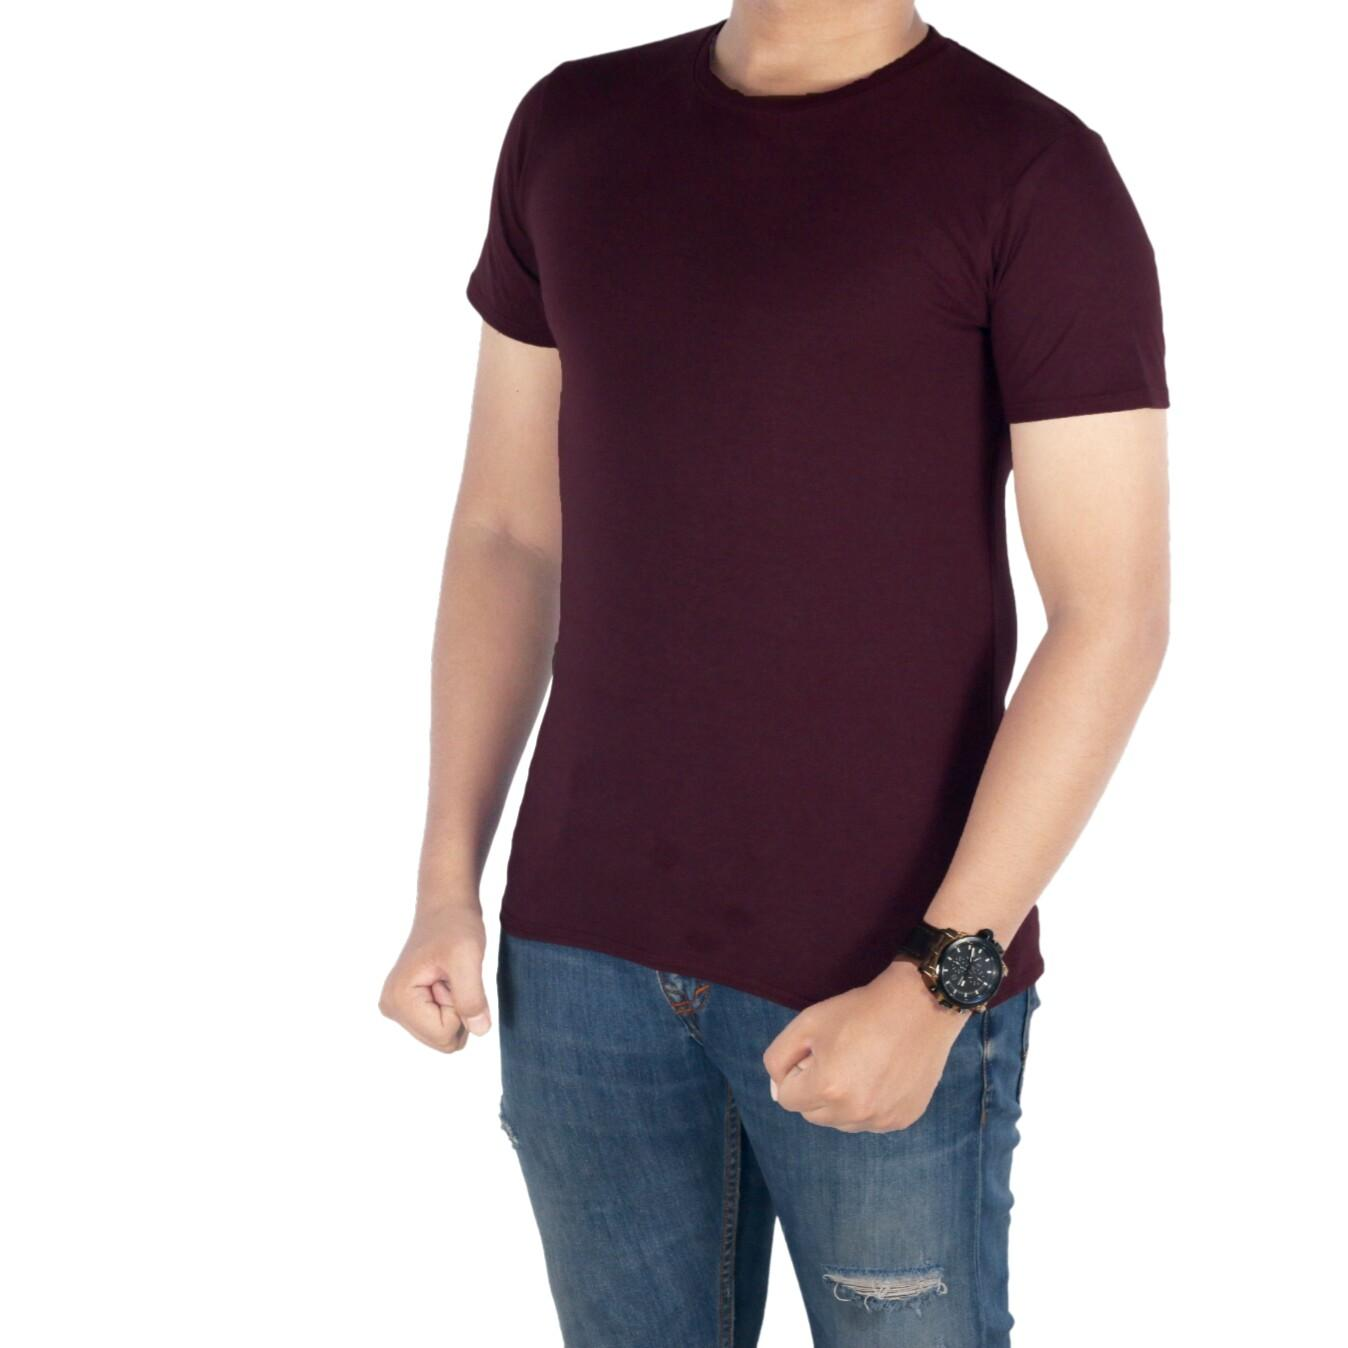 Bsg_fashion1 Baju Kaos Marun Polos Premium/kaos Gildan / baju lengan panjang pria / baju polos lengan panjang pria / baju kaos berwarna pria / BAJU KAOS LENGAN PENDEK PRIA  / BAJU KAOS PRINTIING / BAJU KAOS POLOS PRIA / BAJU KAOS PRIA II 5076